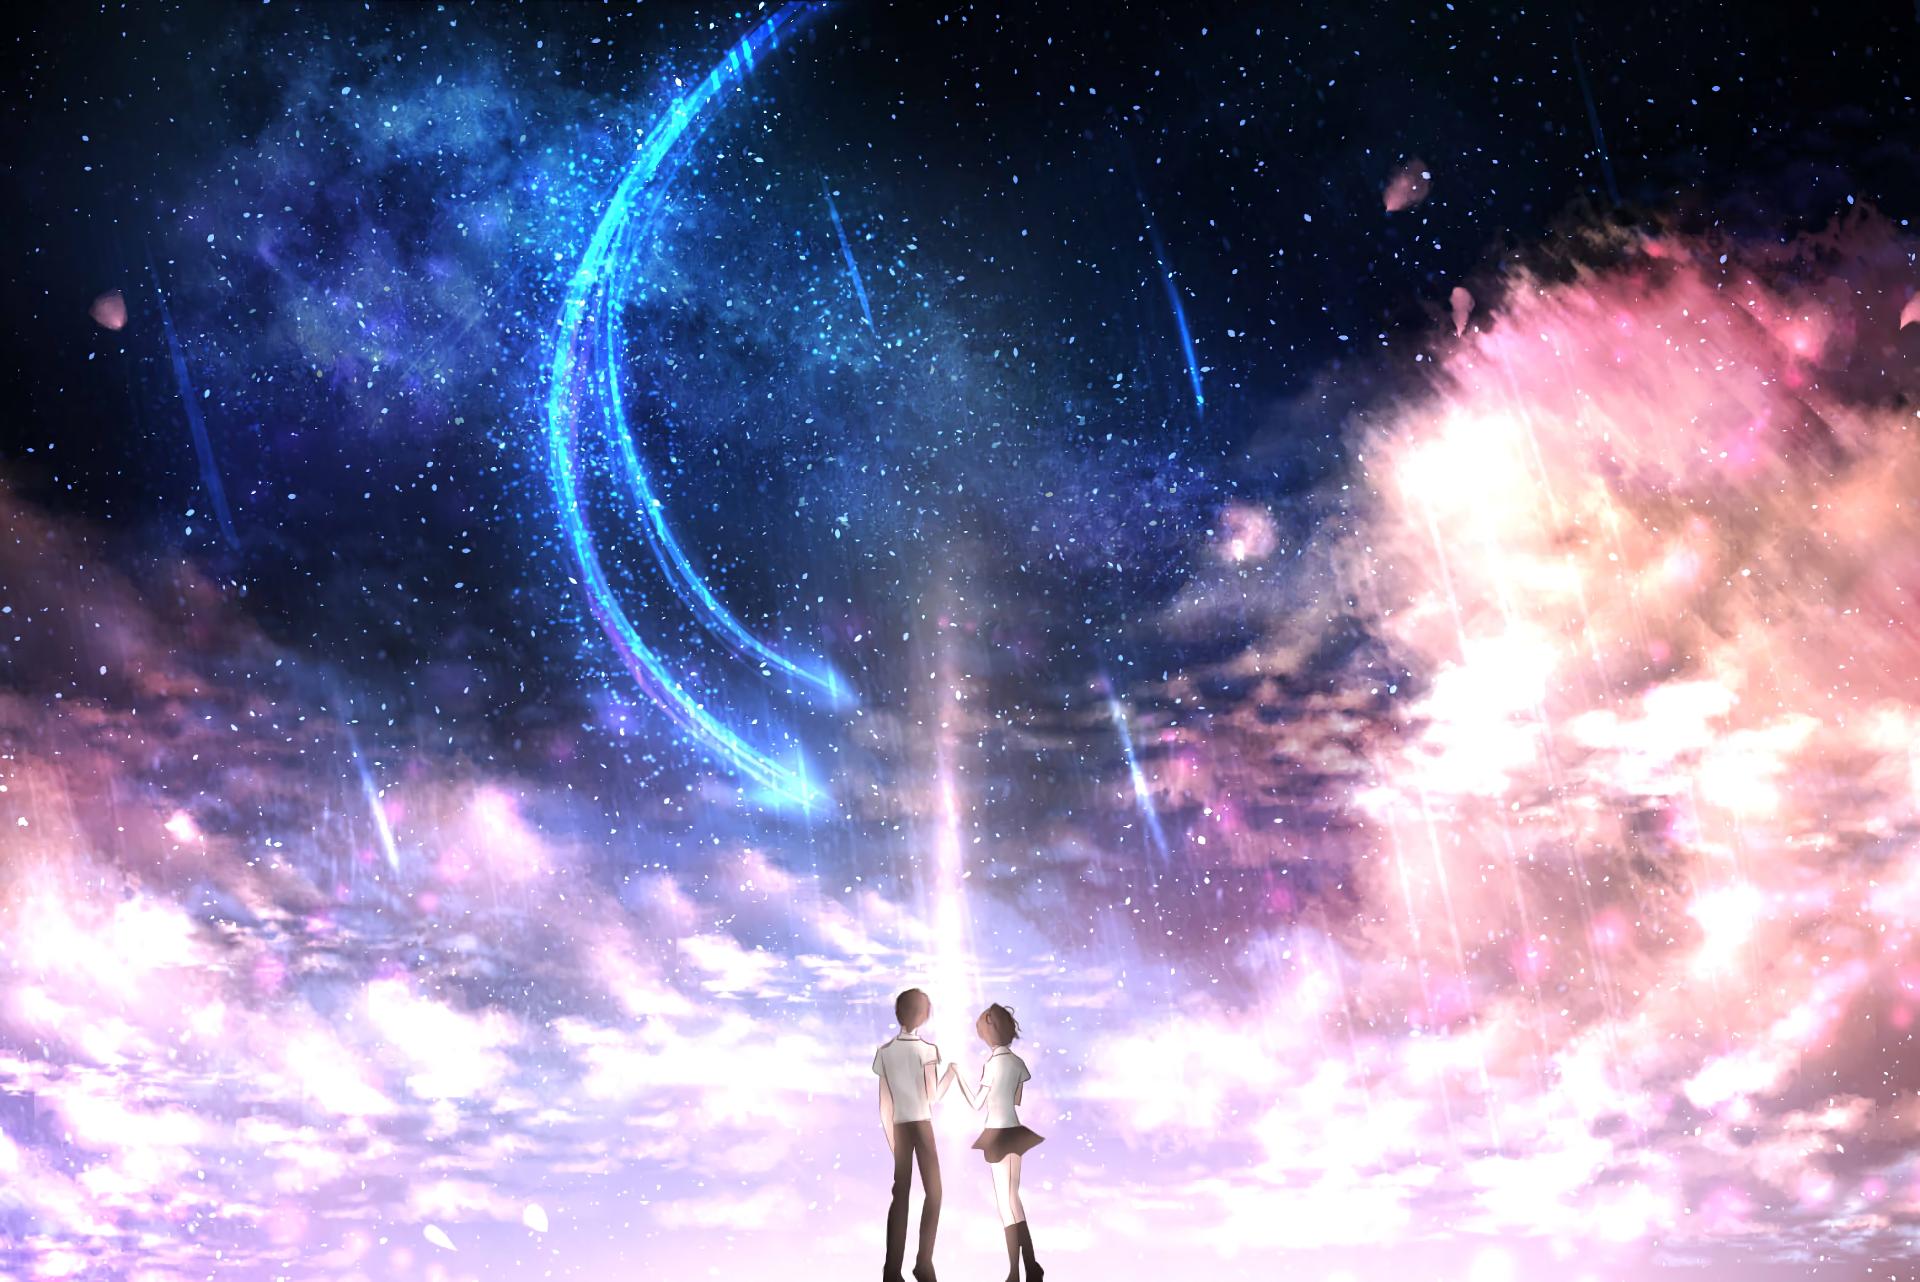 Download 500+ Wallpaper Abyss Kimi No Na Wa HD Terbaru